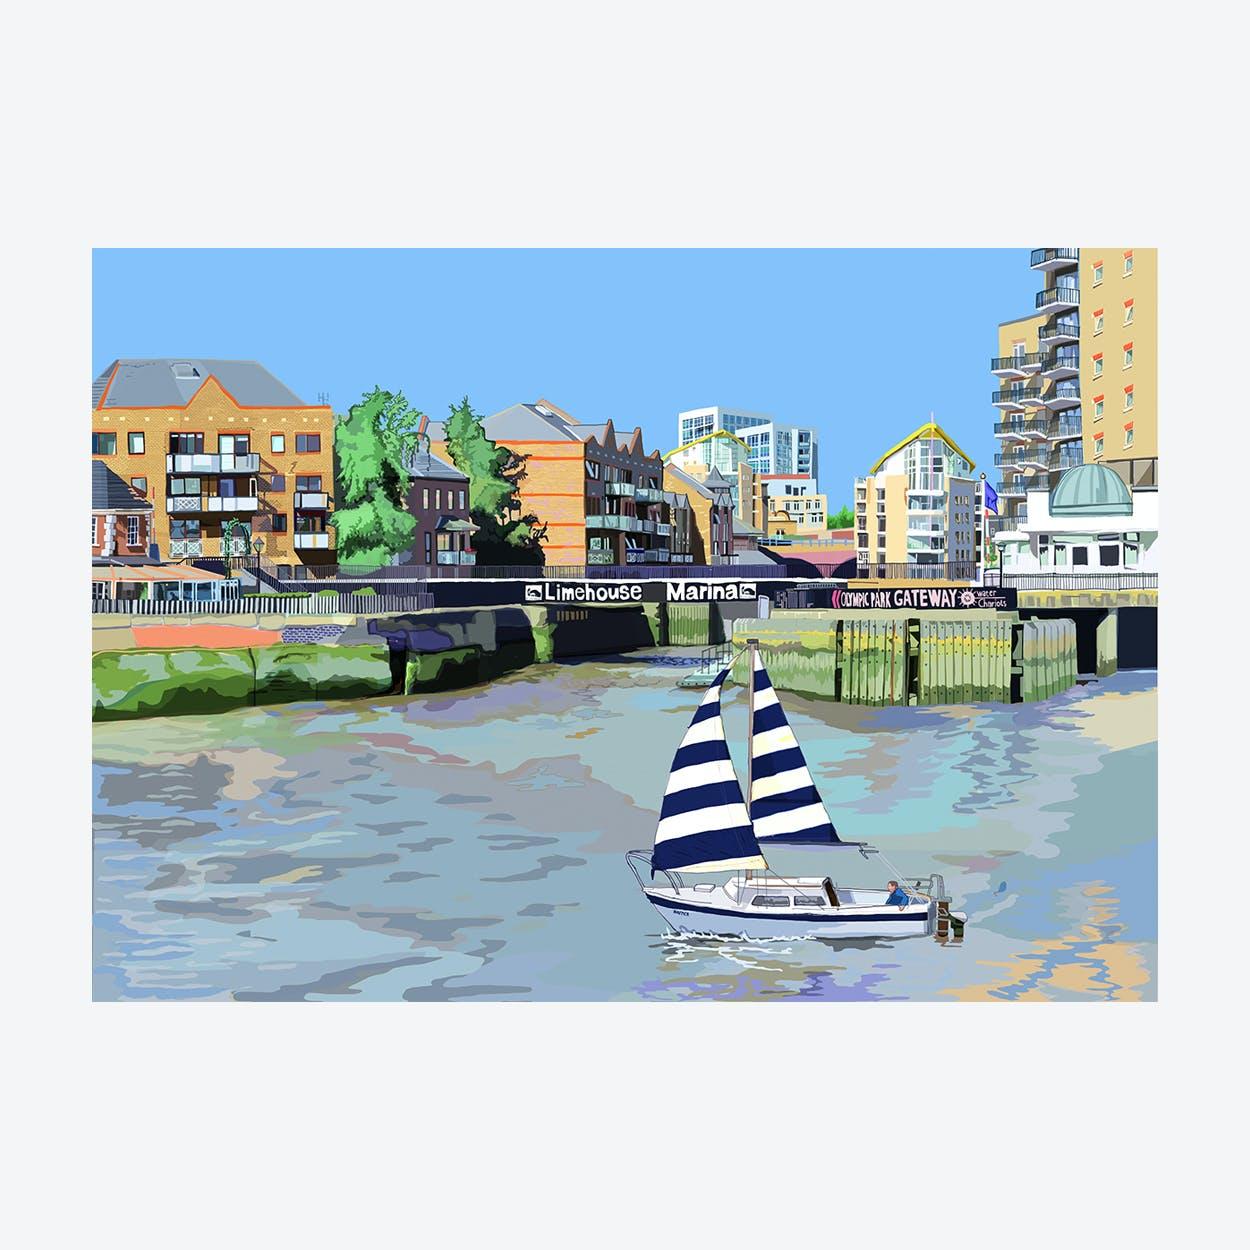 Limehouse Marina Entrance A3 Print